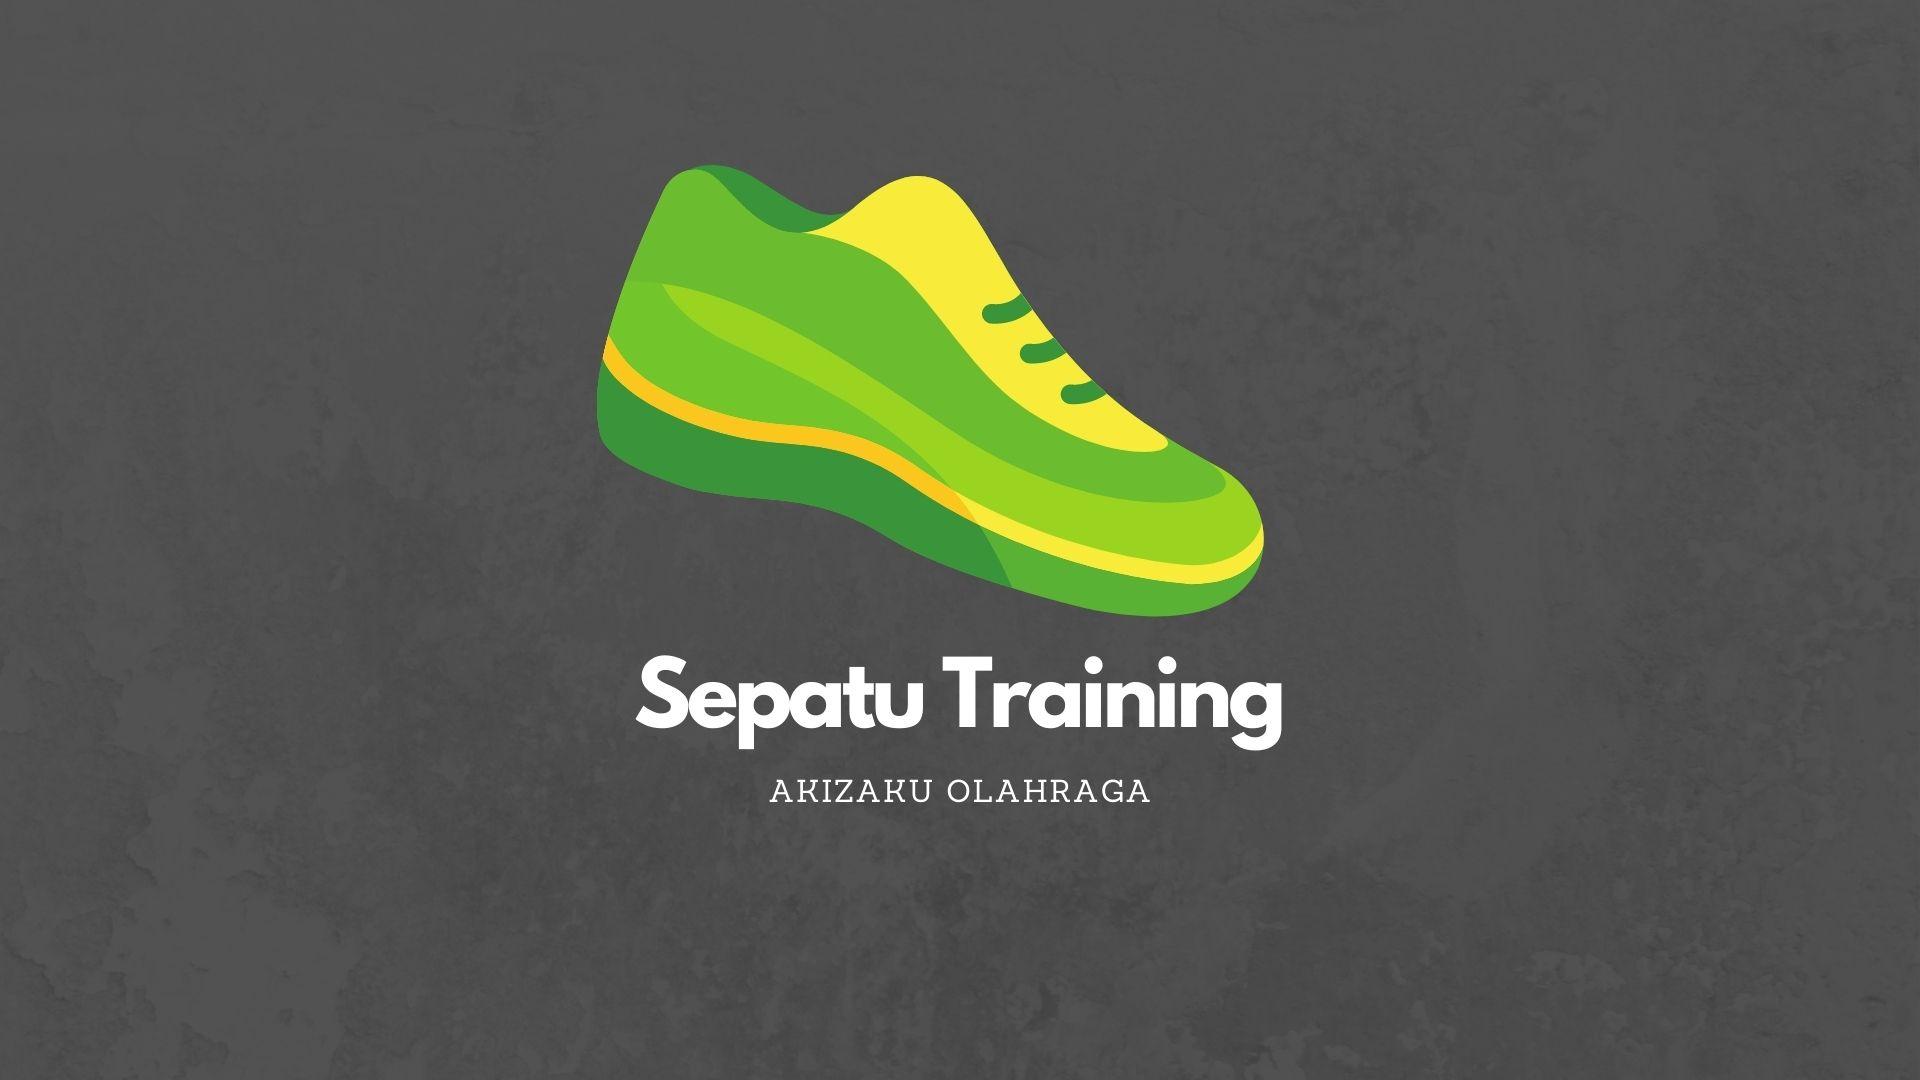 [Image: Sepatu-training.jpg]